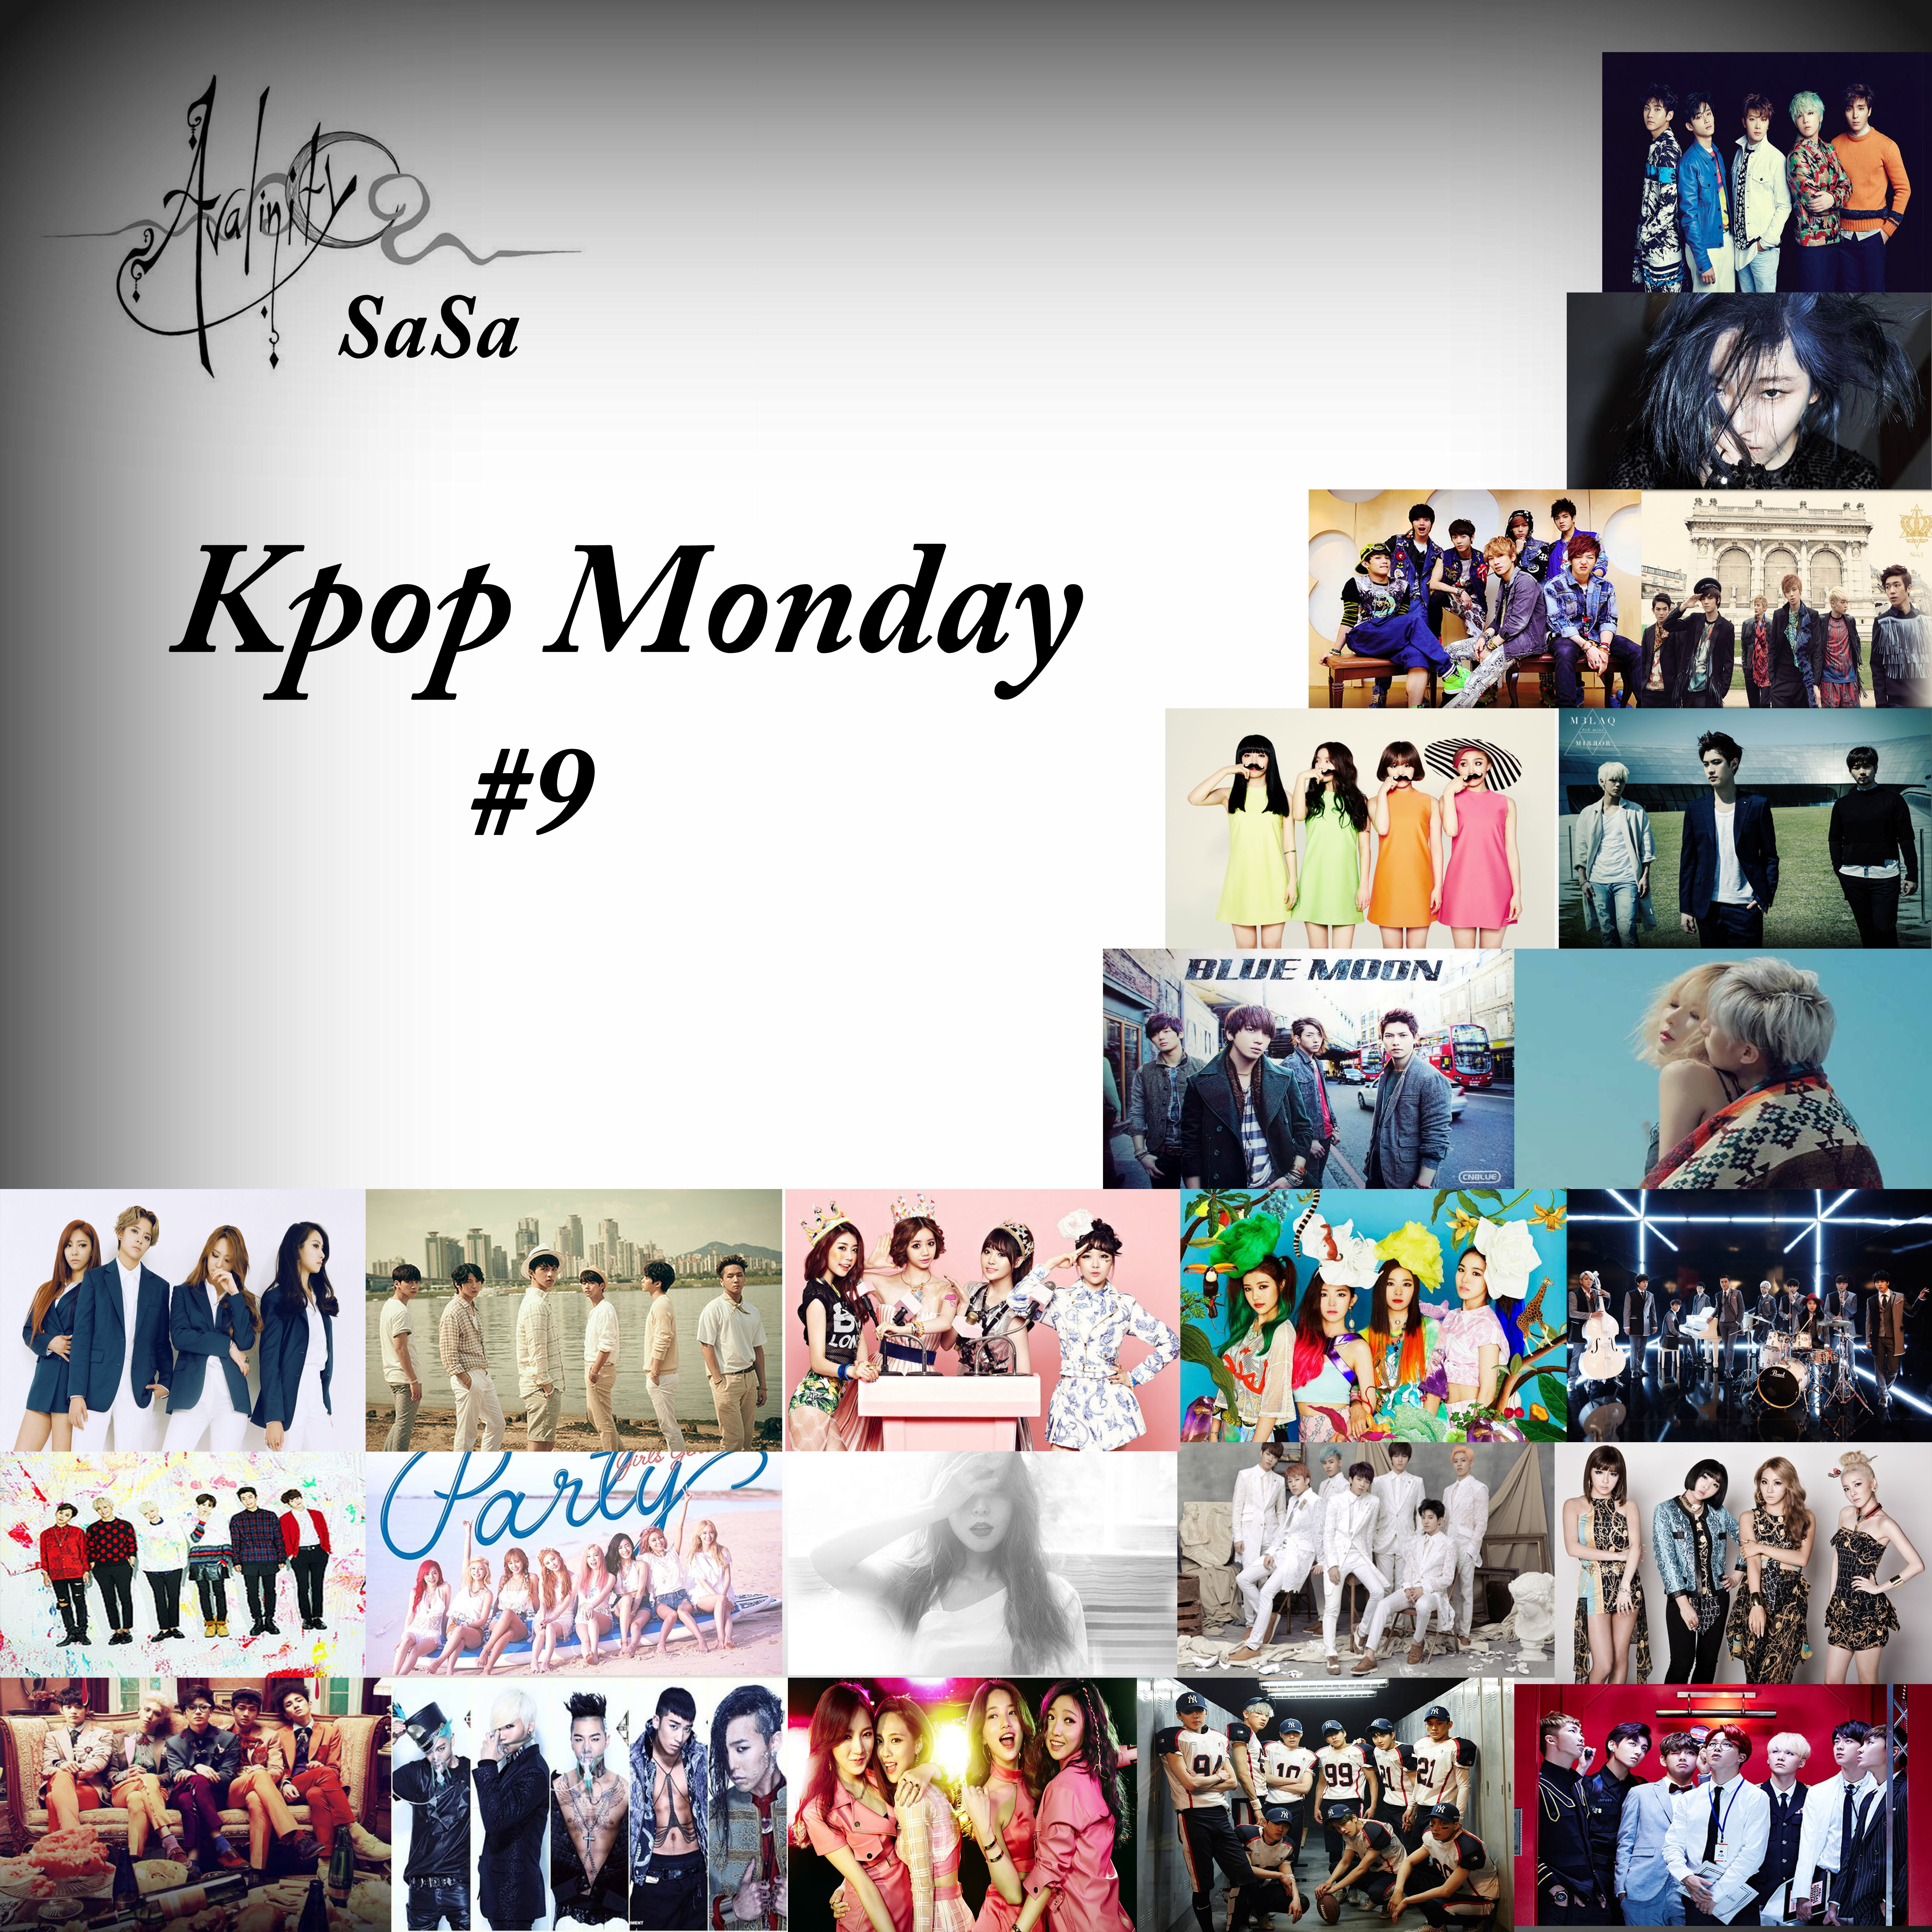 kpop monday bkg kopia 9